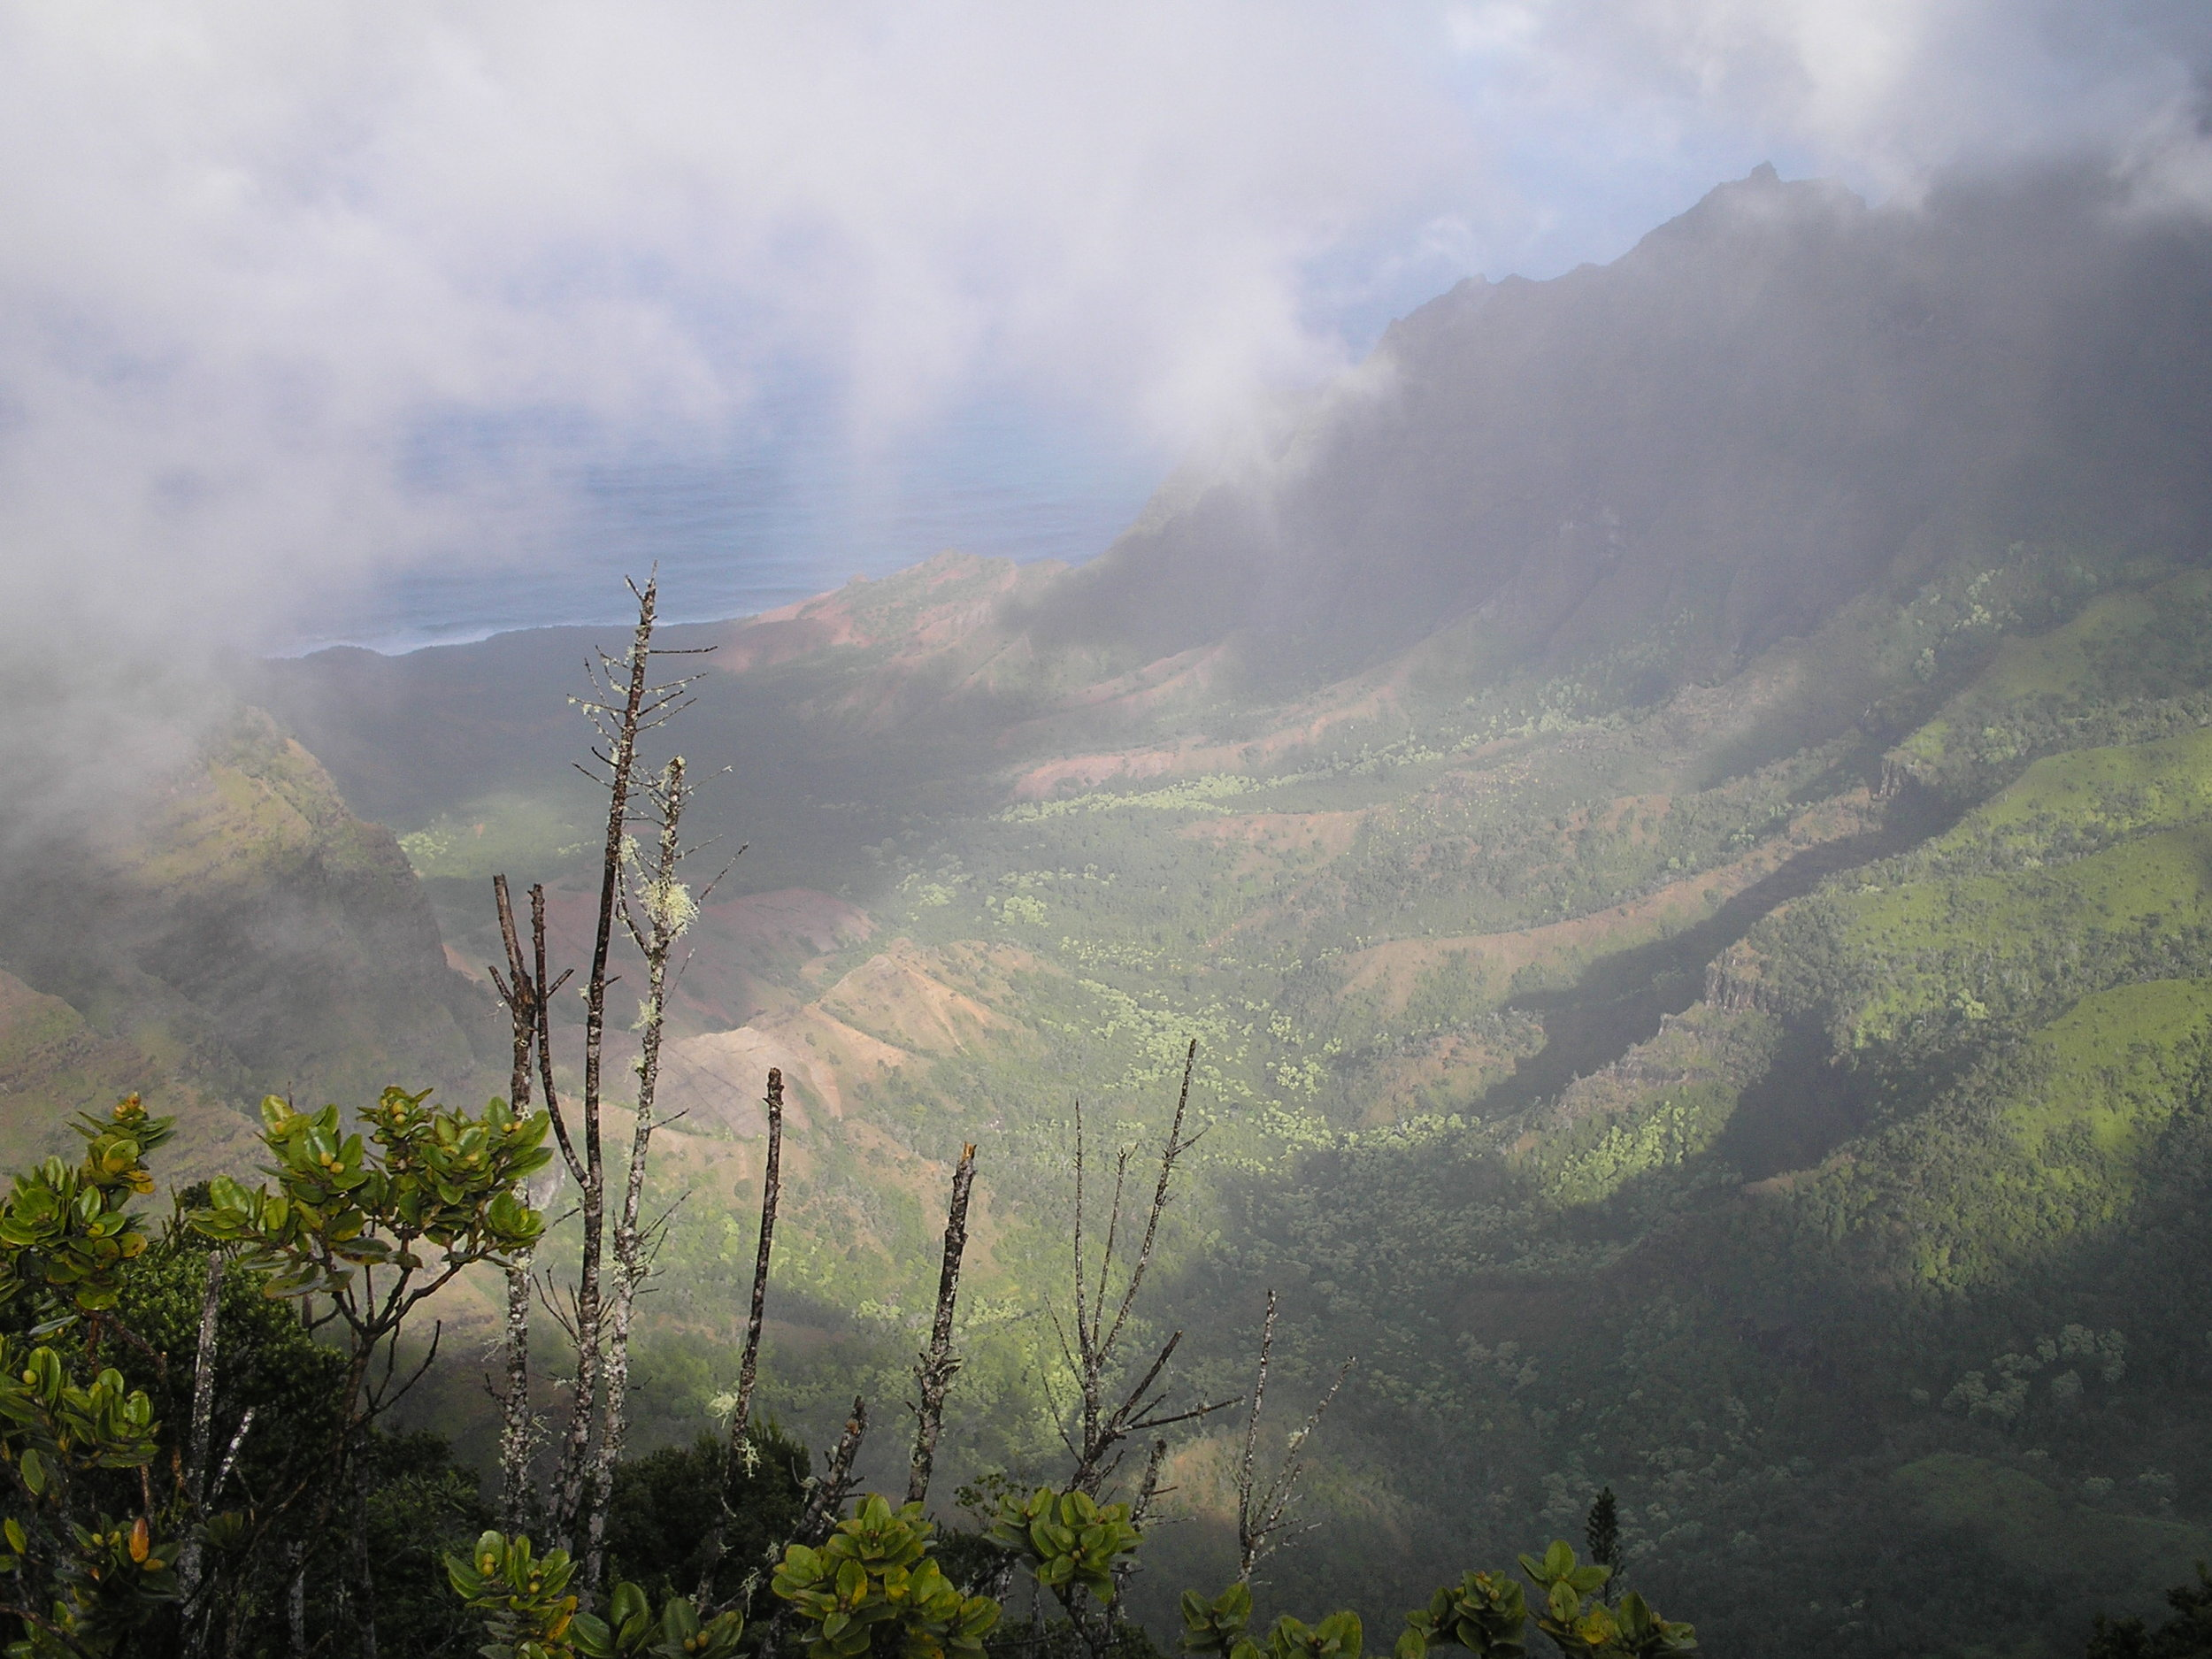 misty kalalau valley.jpg